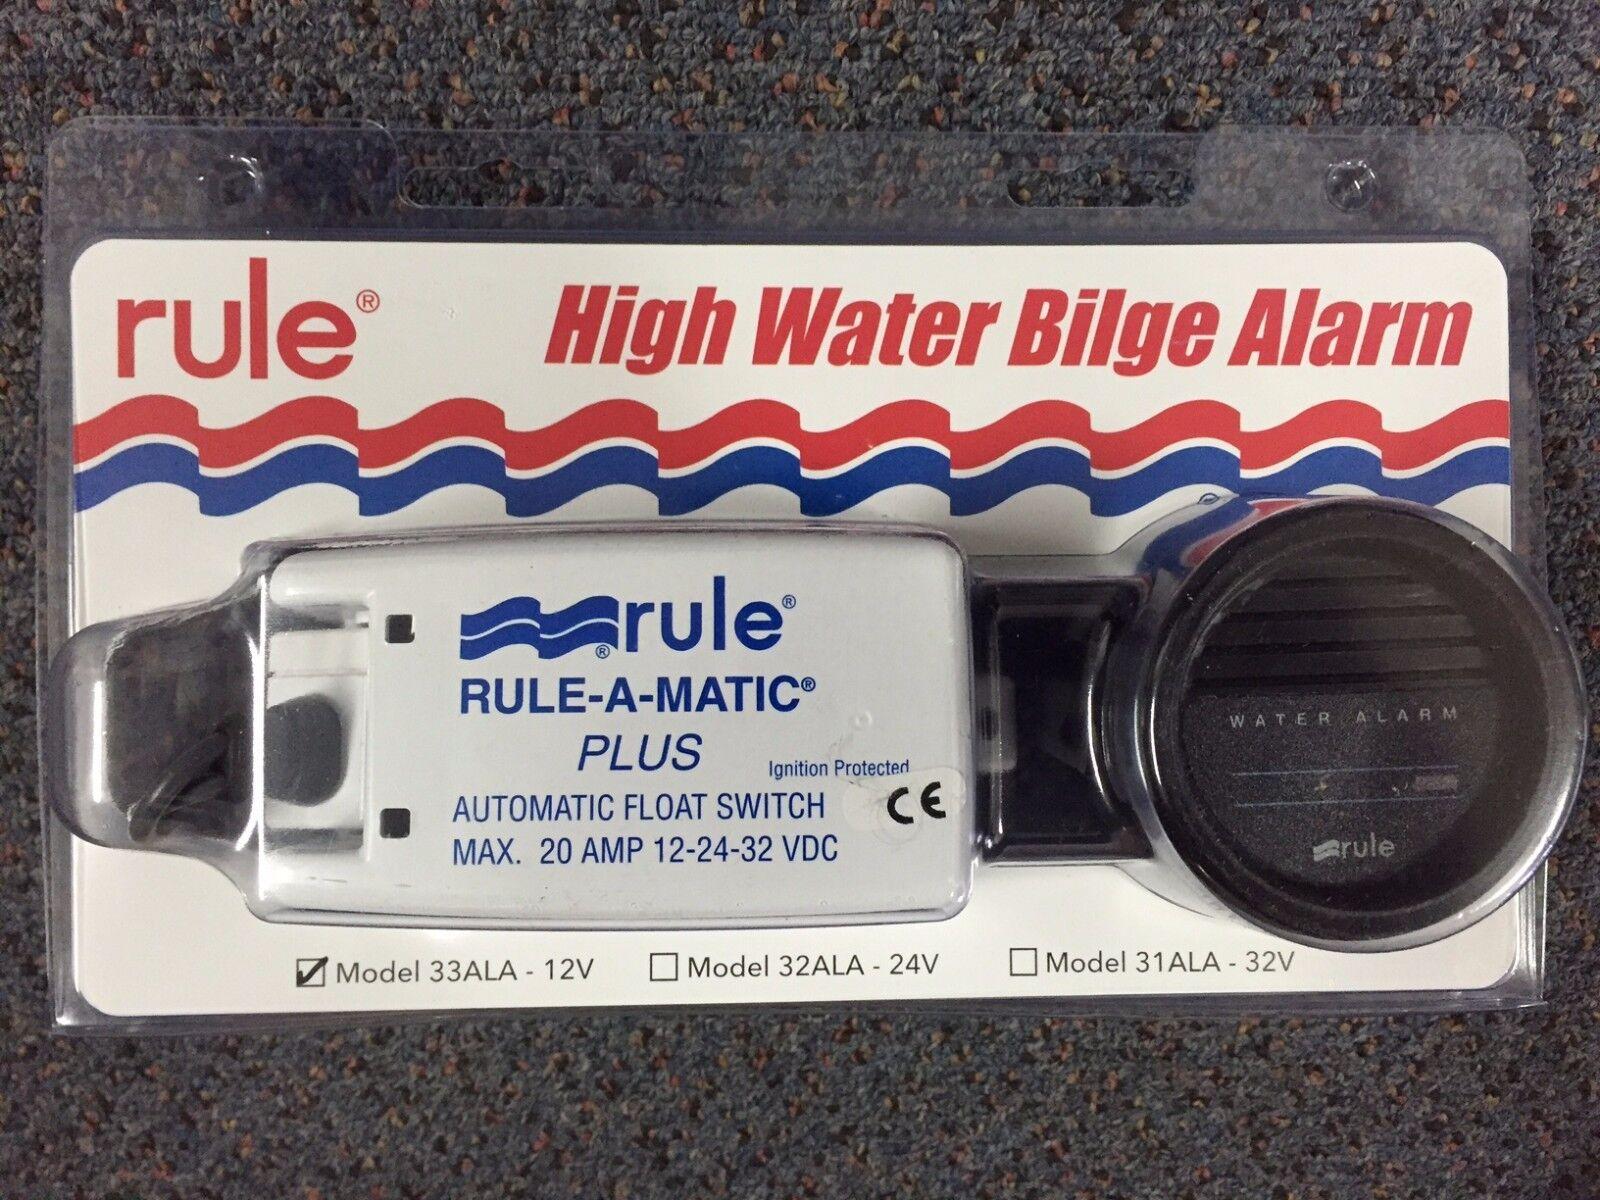 Bilge Pump Alarm High Water Alarm with Float Switch and Gauge 12 Volt